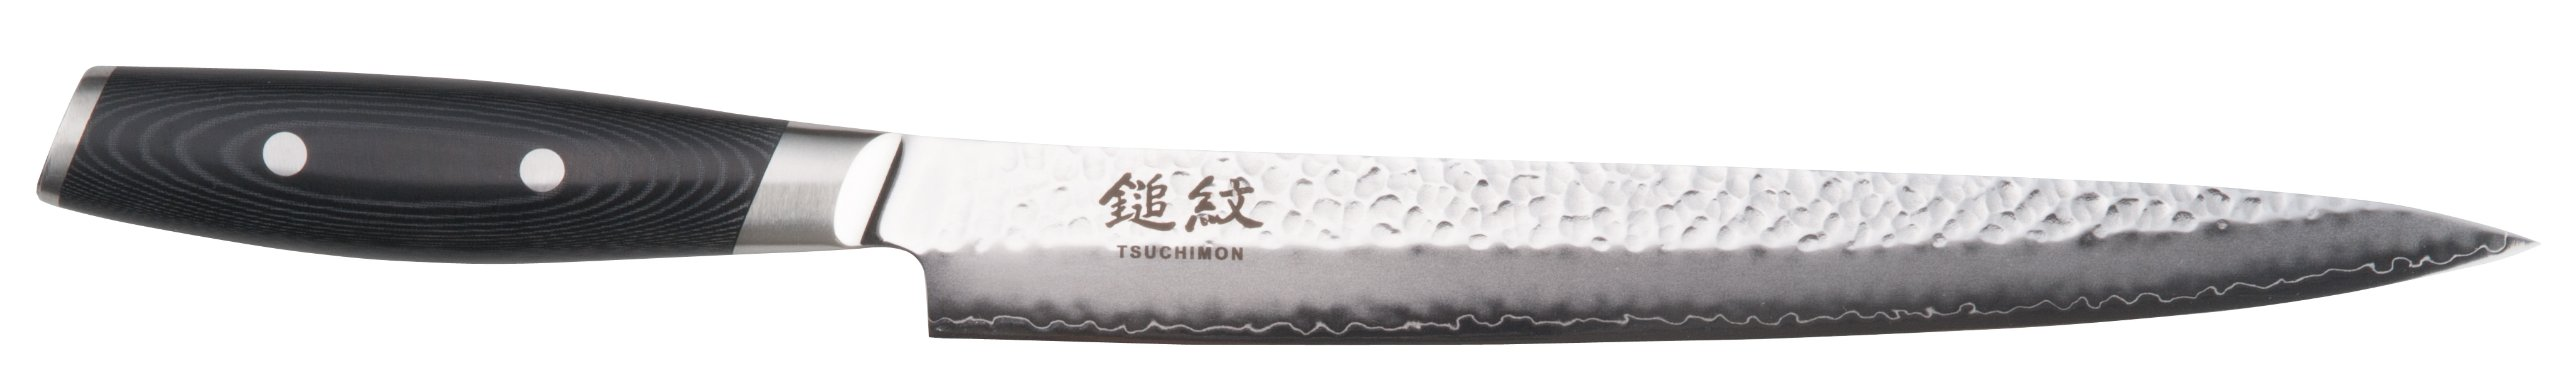 Yaxell Tsuchimon Slicer Knife, 10-inch